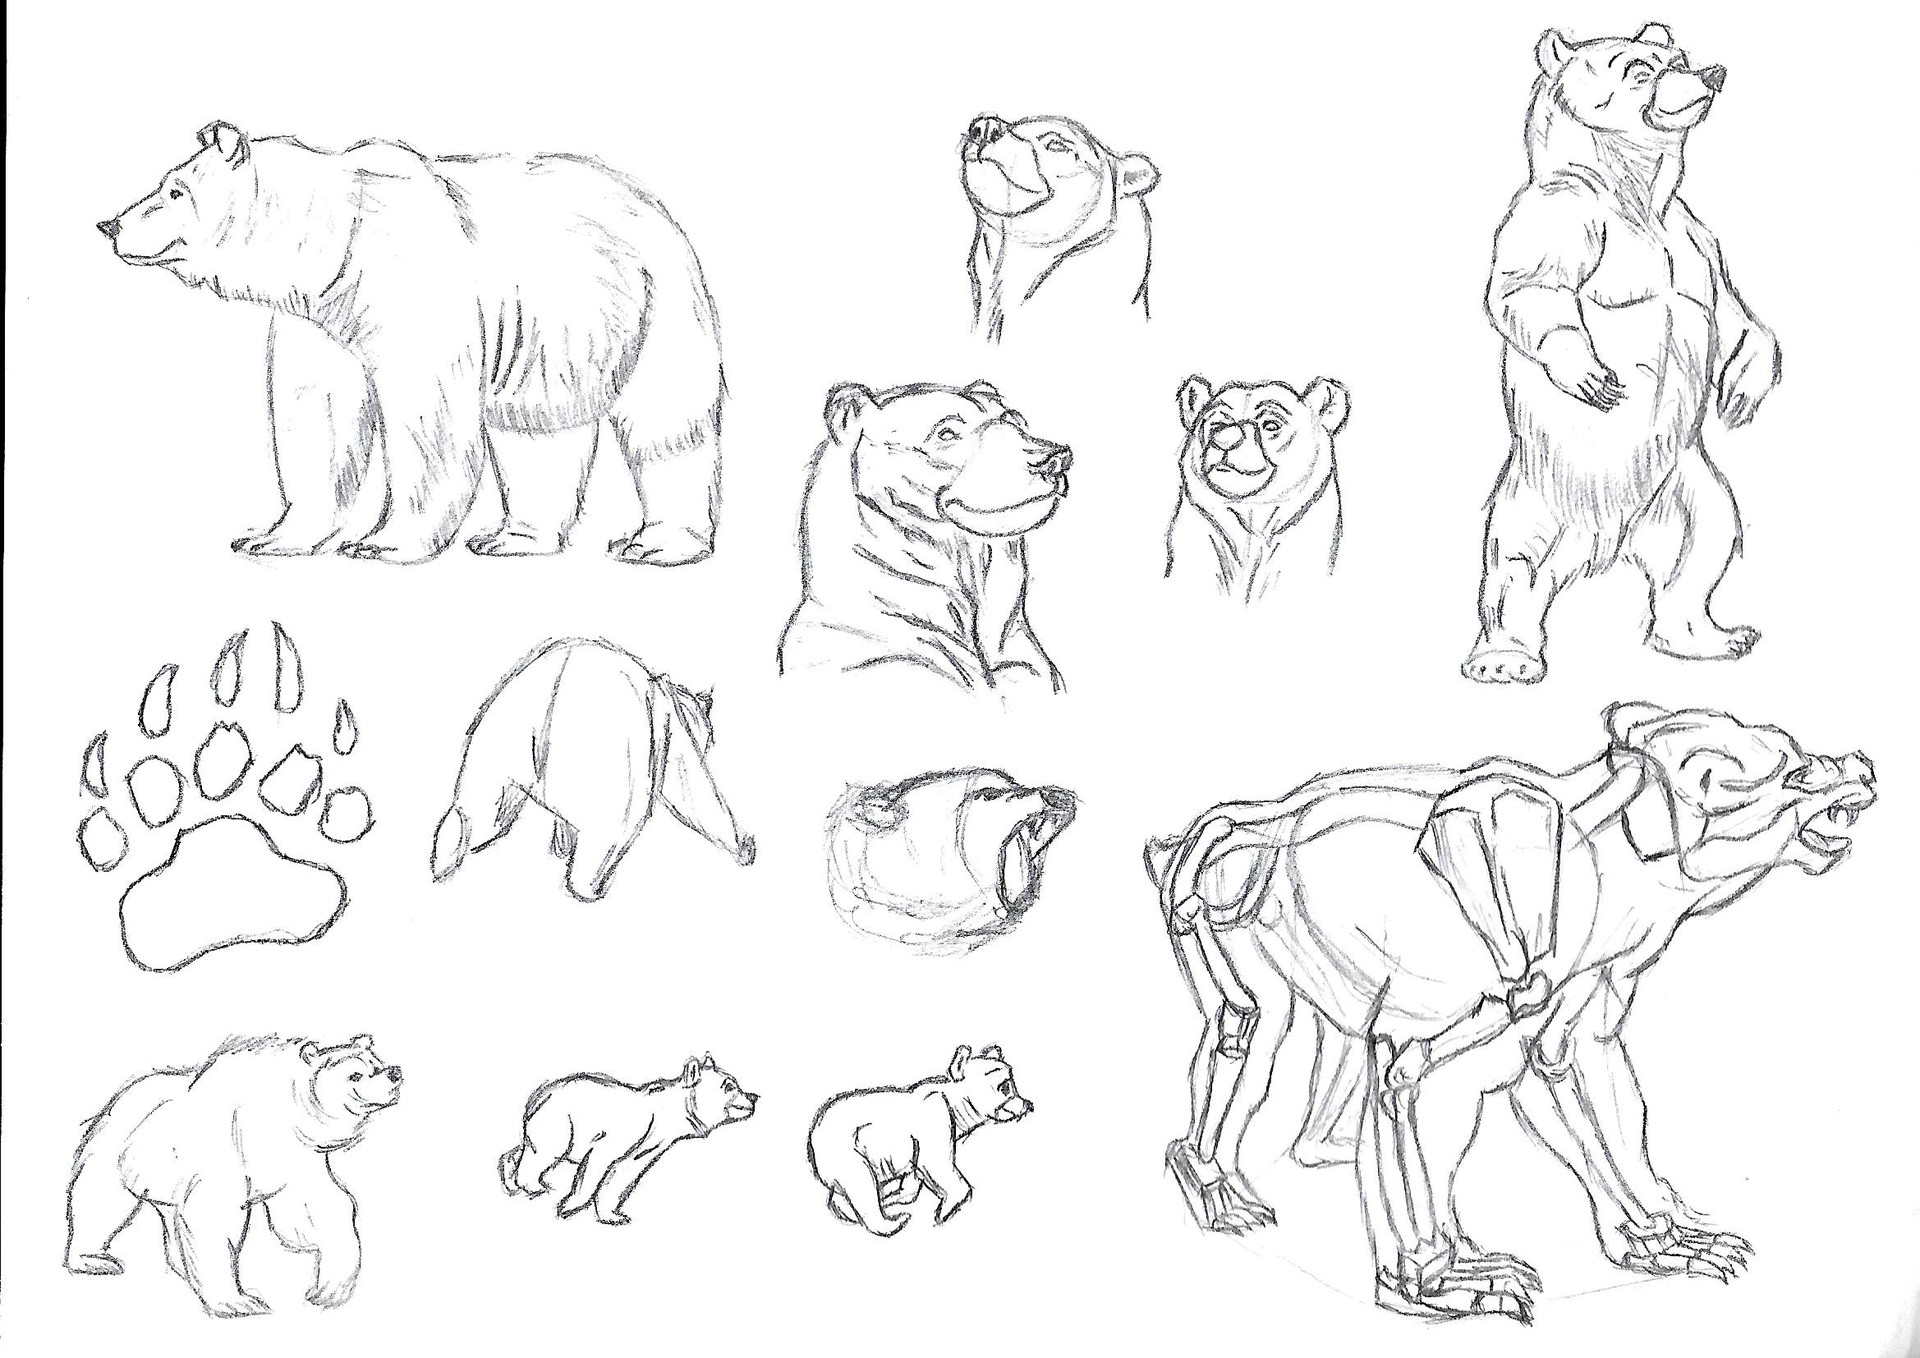 Iván Benito - Bear anatomy study